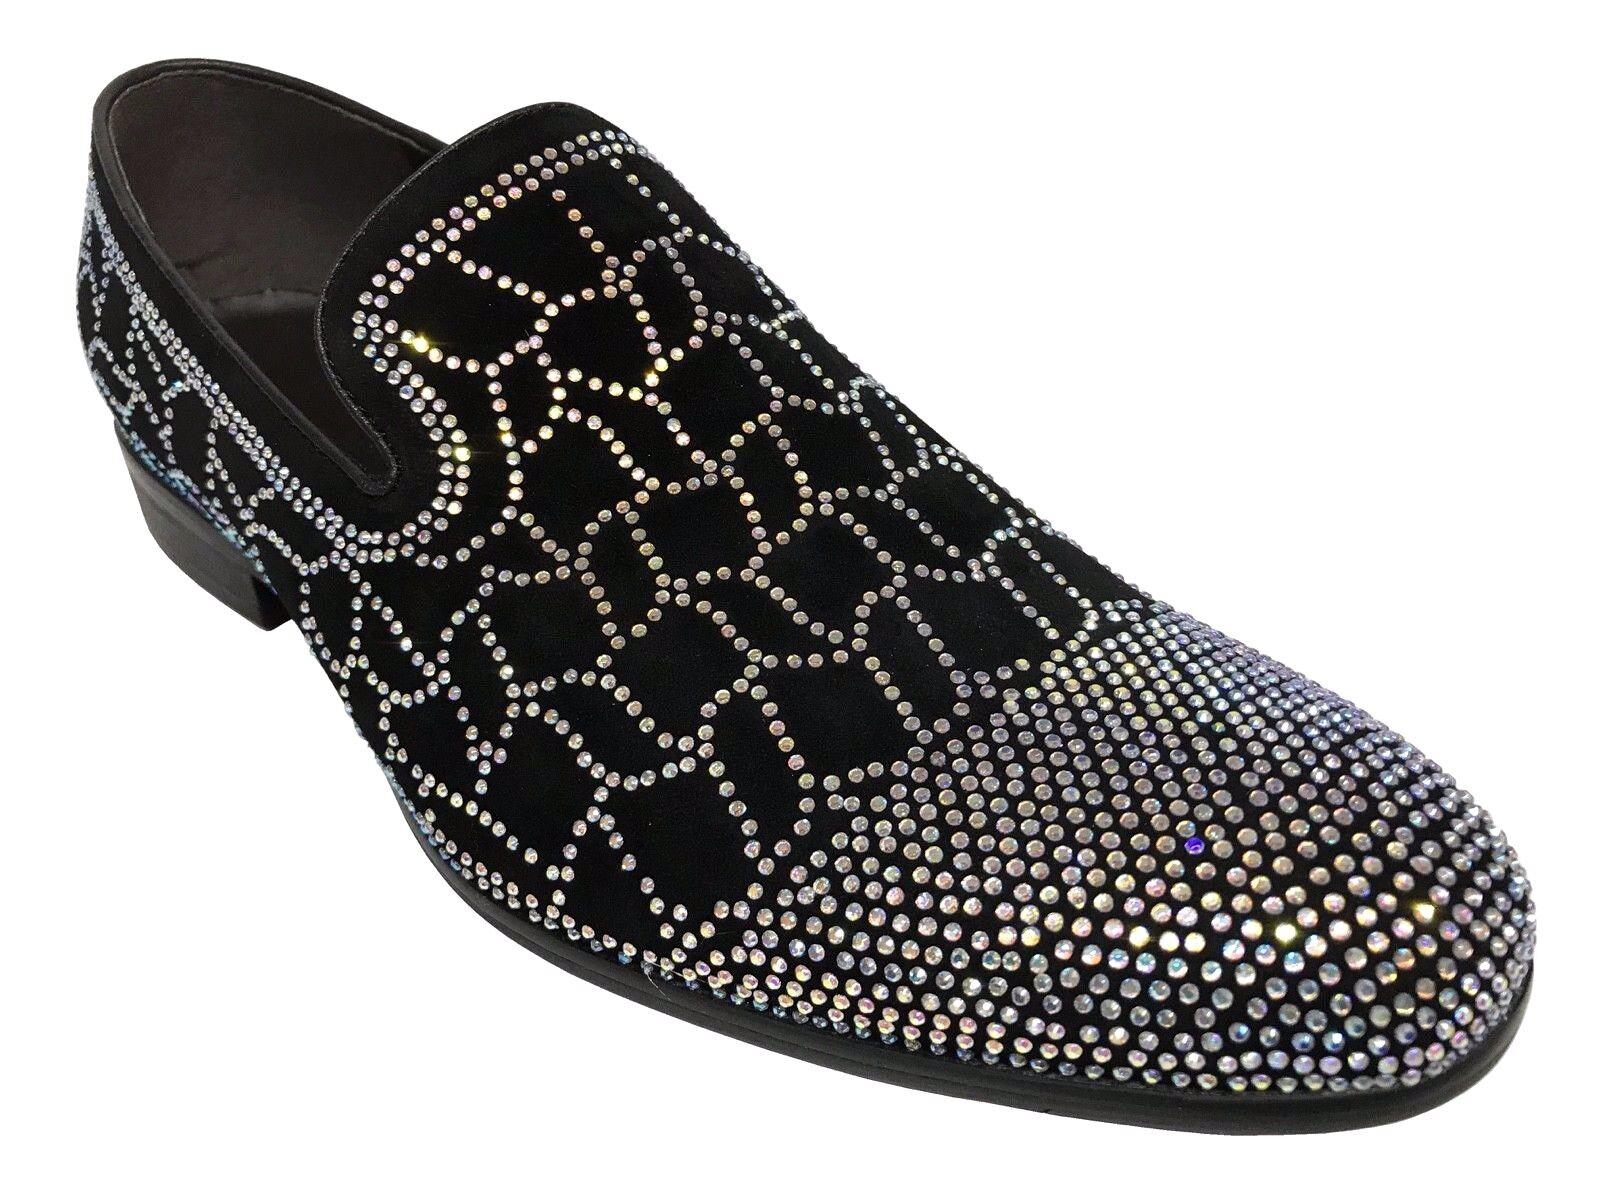 ZOTA UNIQUE Men's Crystal Design Fashion Black Silver Suede Loafers  GF835-105